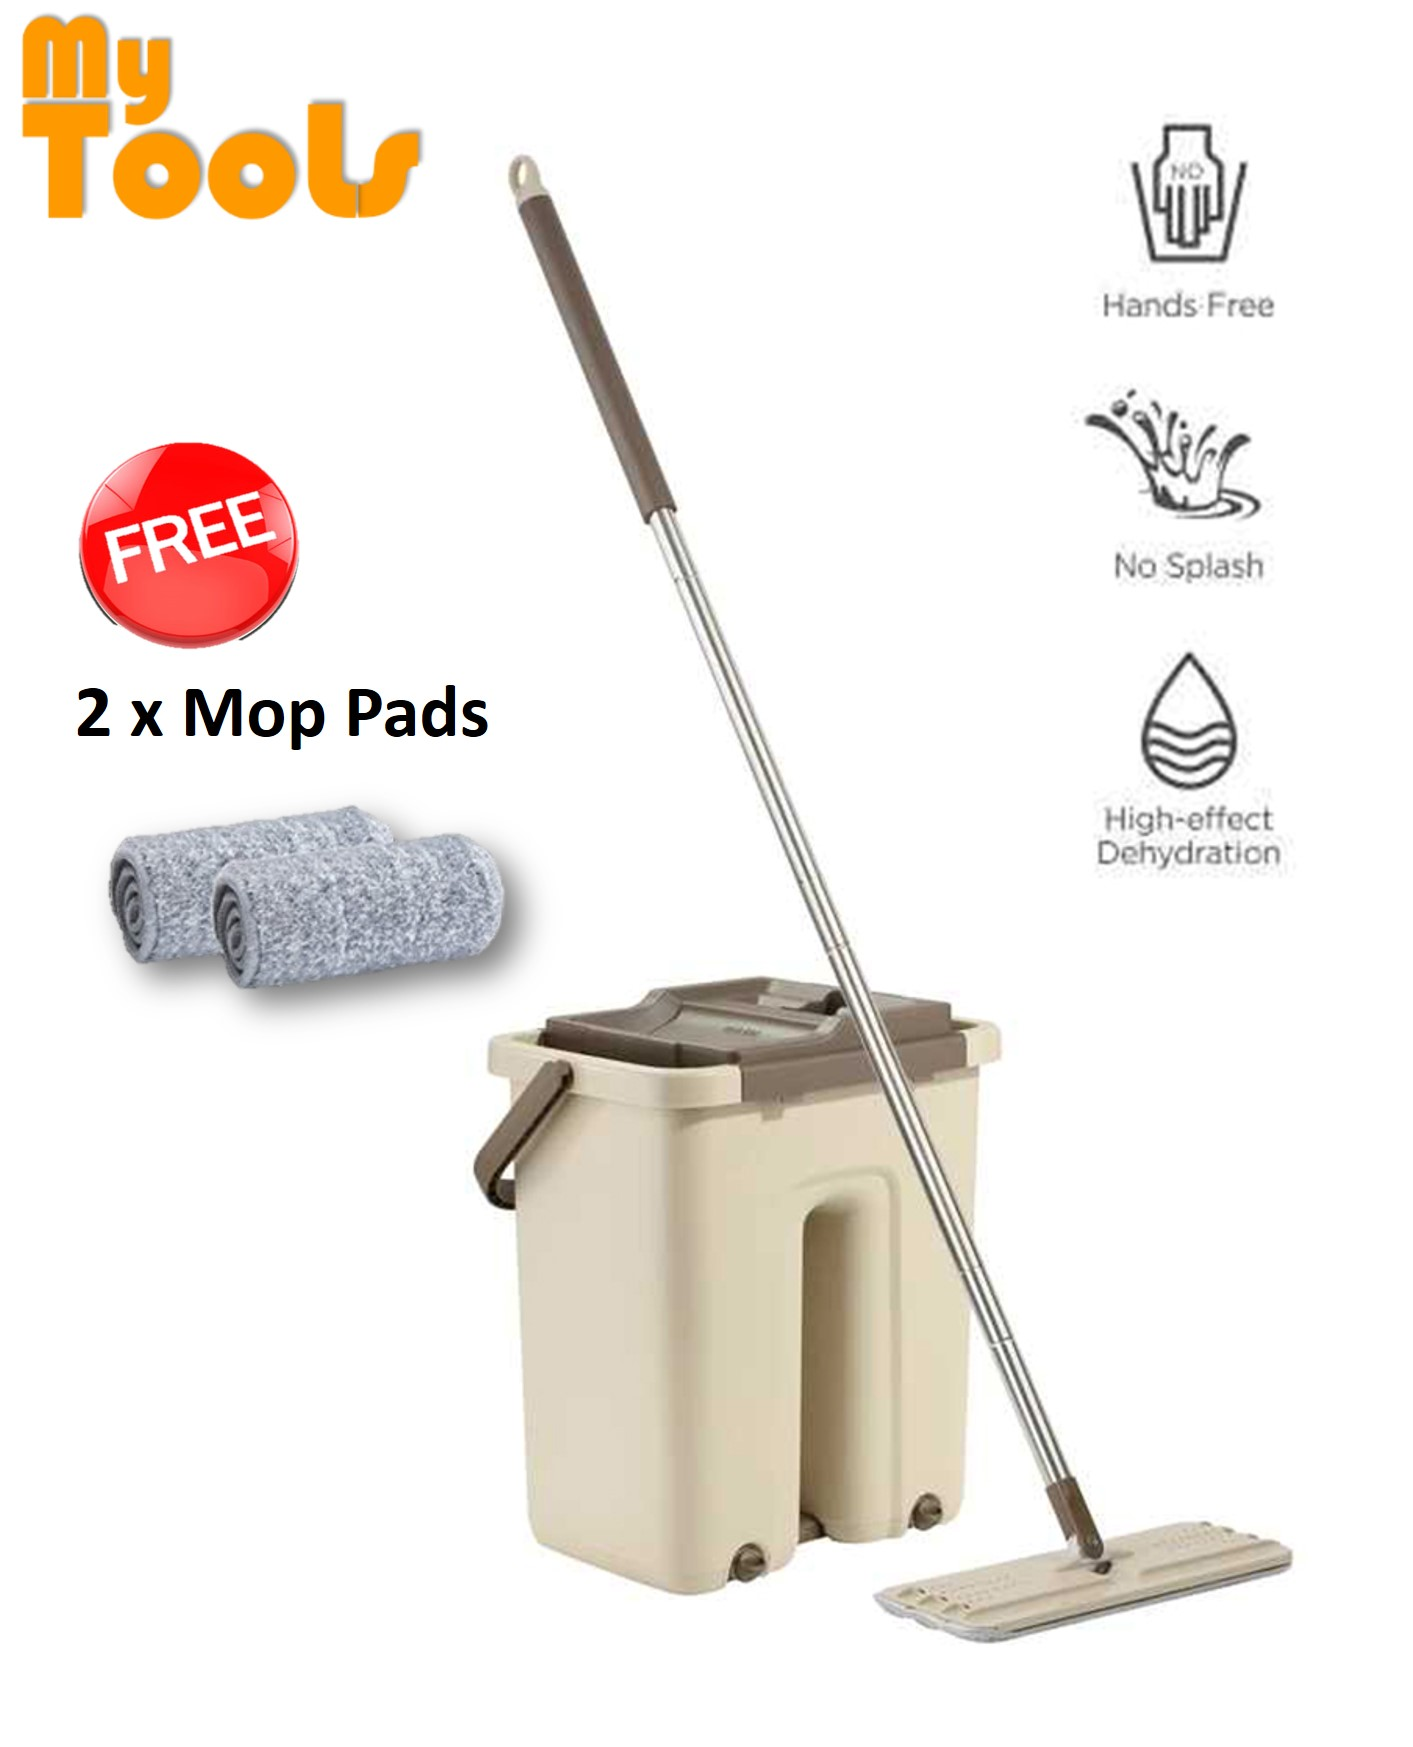 Mytools Easy Clean Scratch Magic Flat Spin Mop -Free 2 Microfiber Cloths